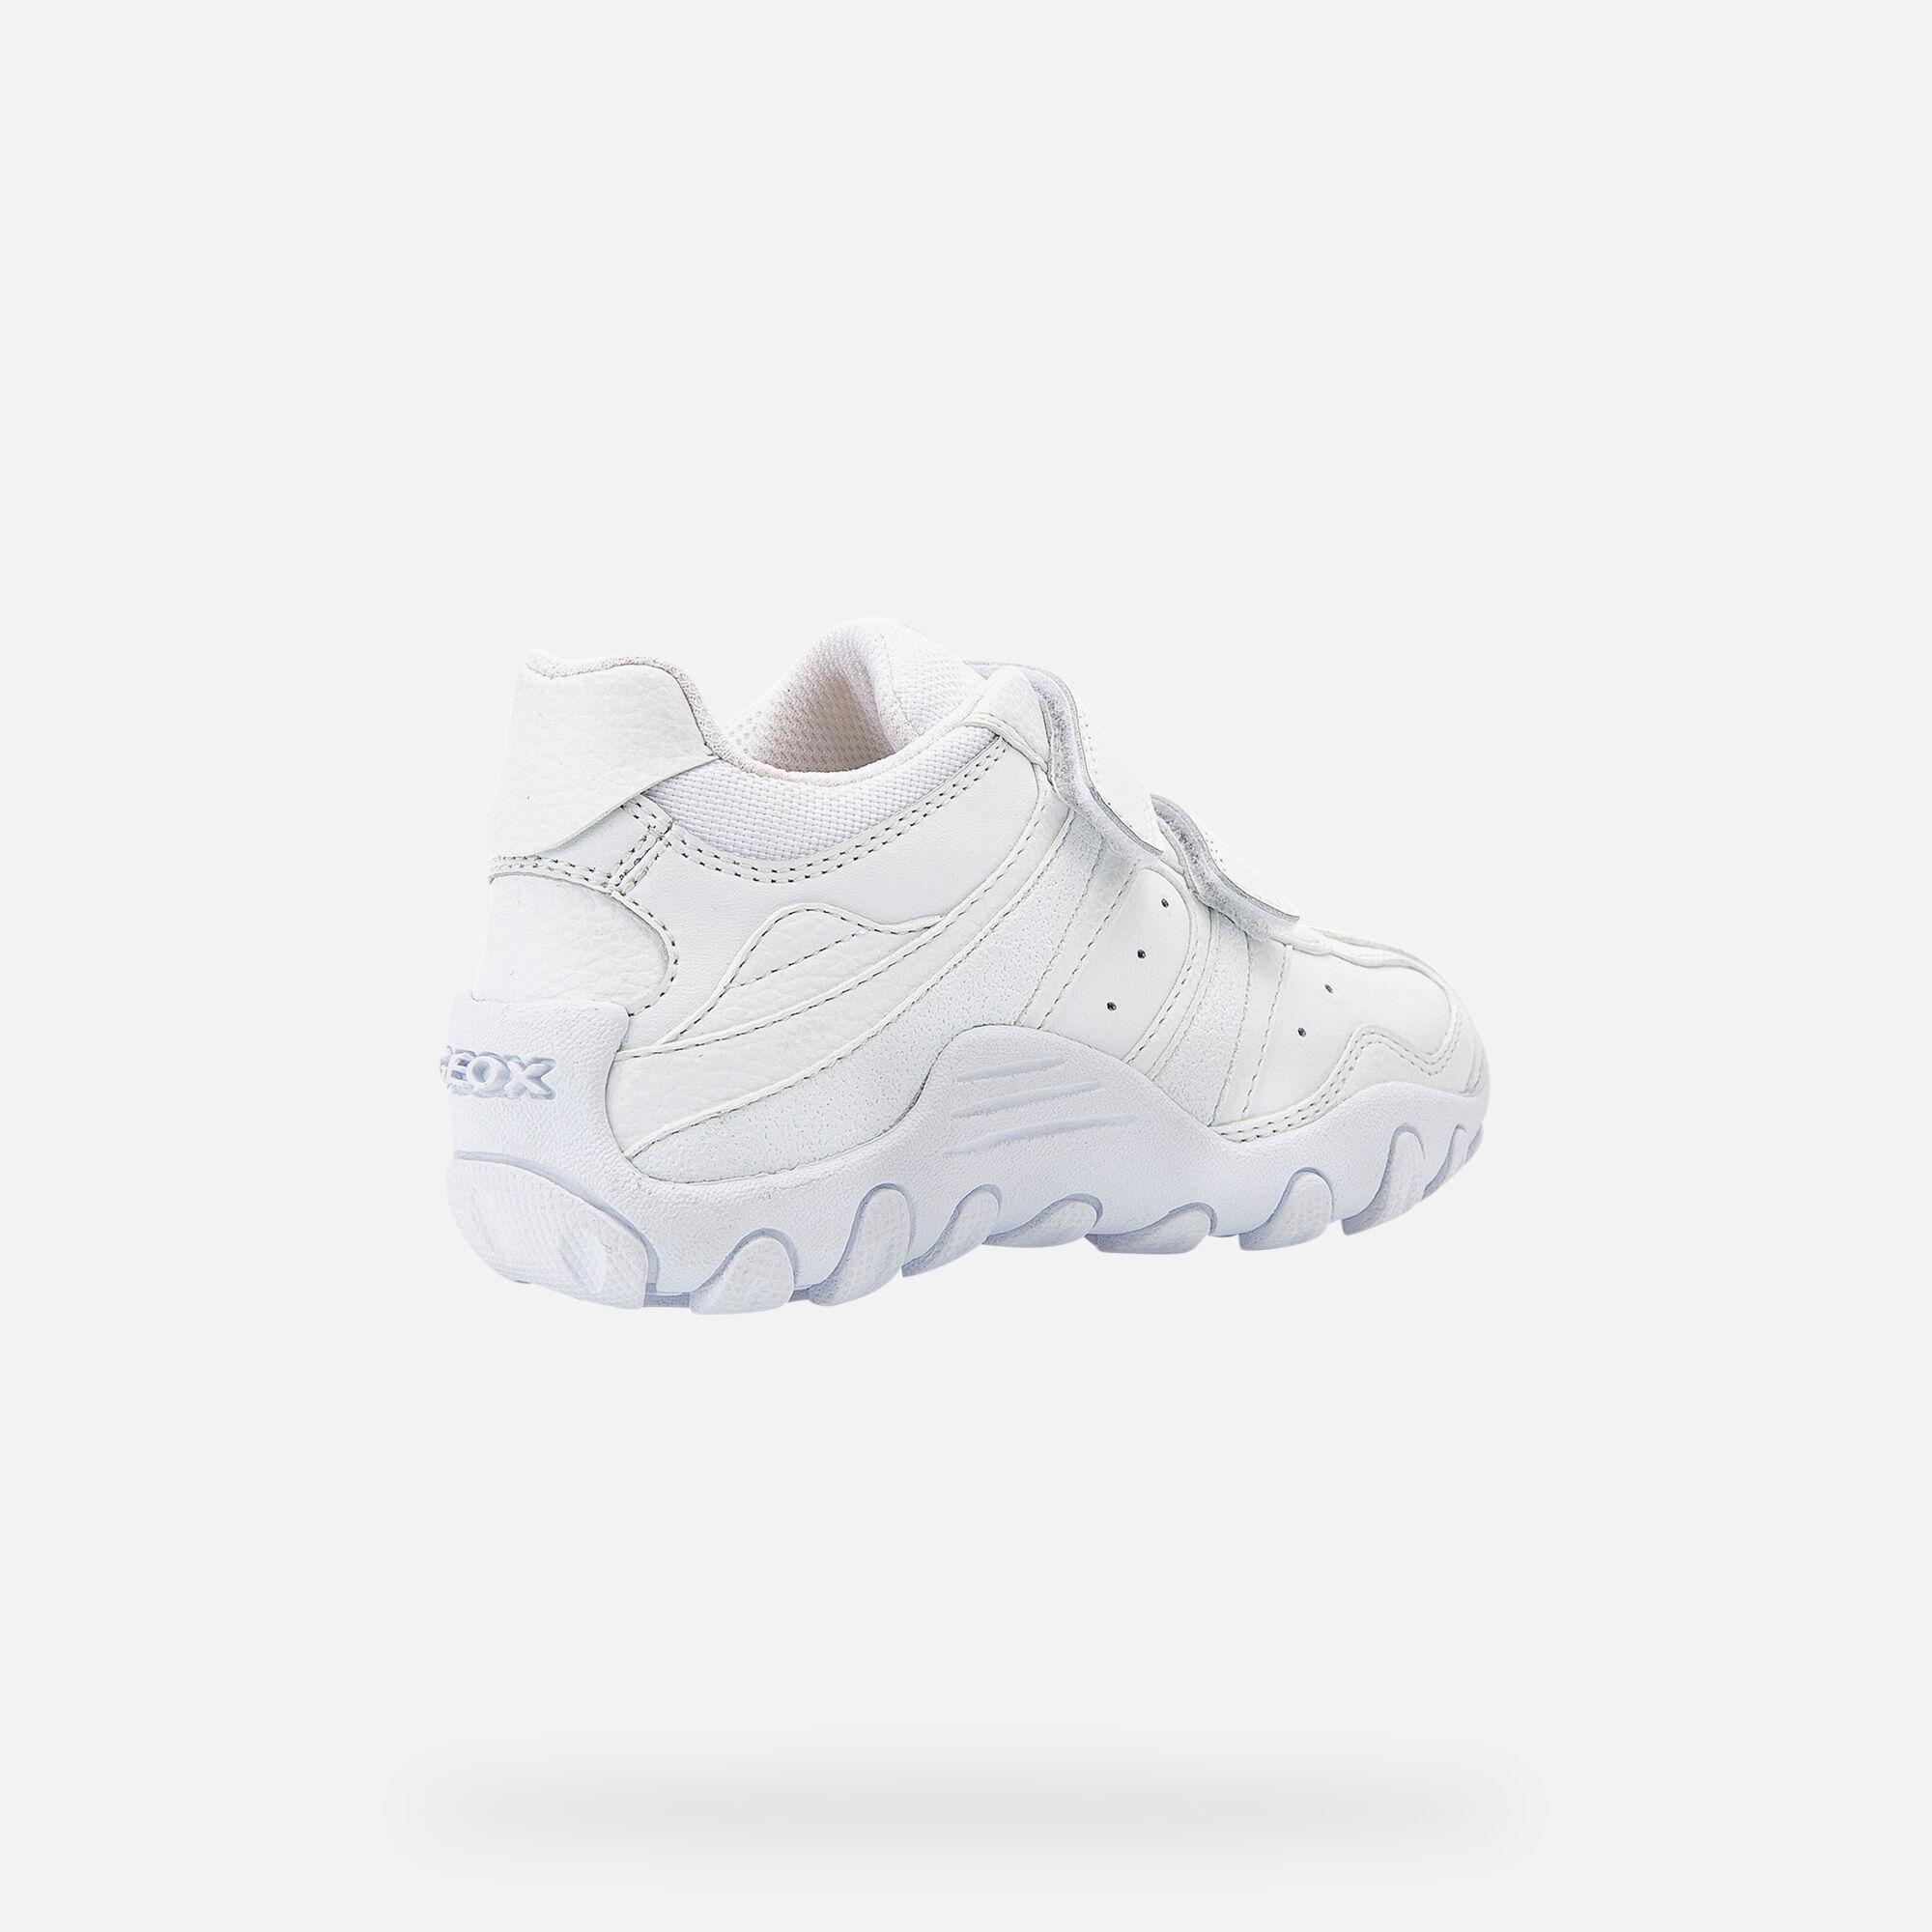 Geox CRUSH Bambino: Sneakers Bianche | Geox SS20